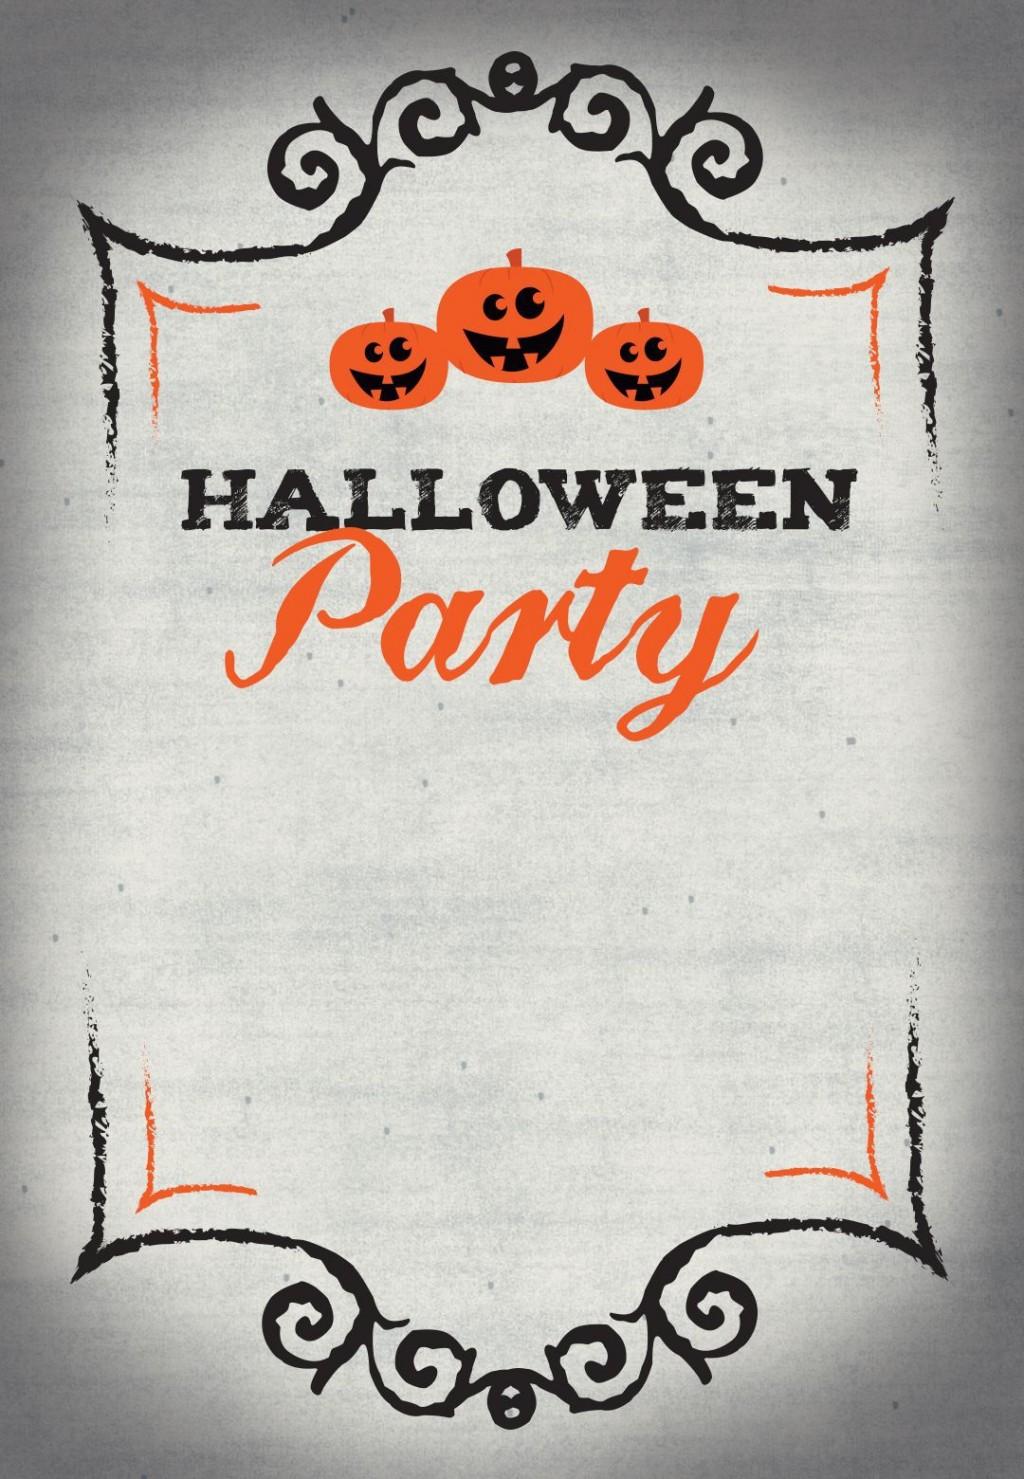 006 Outstanding Free Halloween Invitation Template Inspiration  Templates Online Printable Birthday Party WeddingLarge